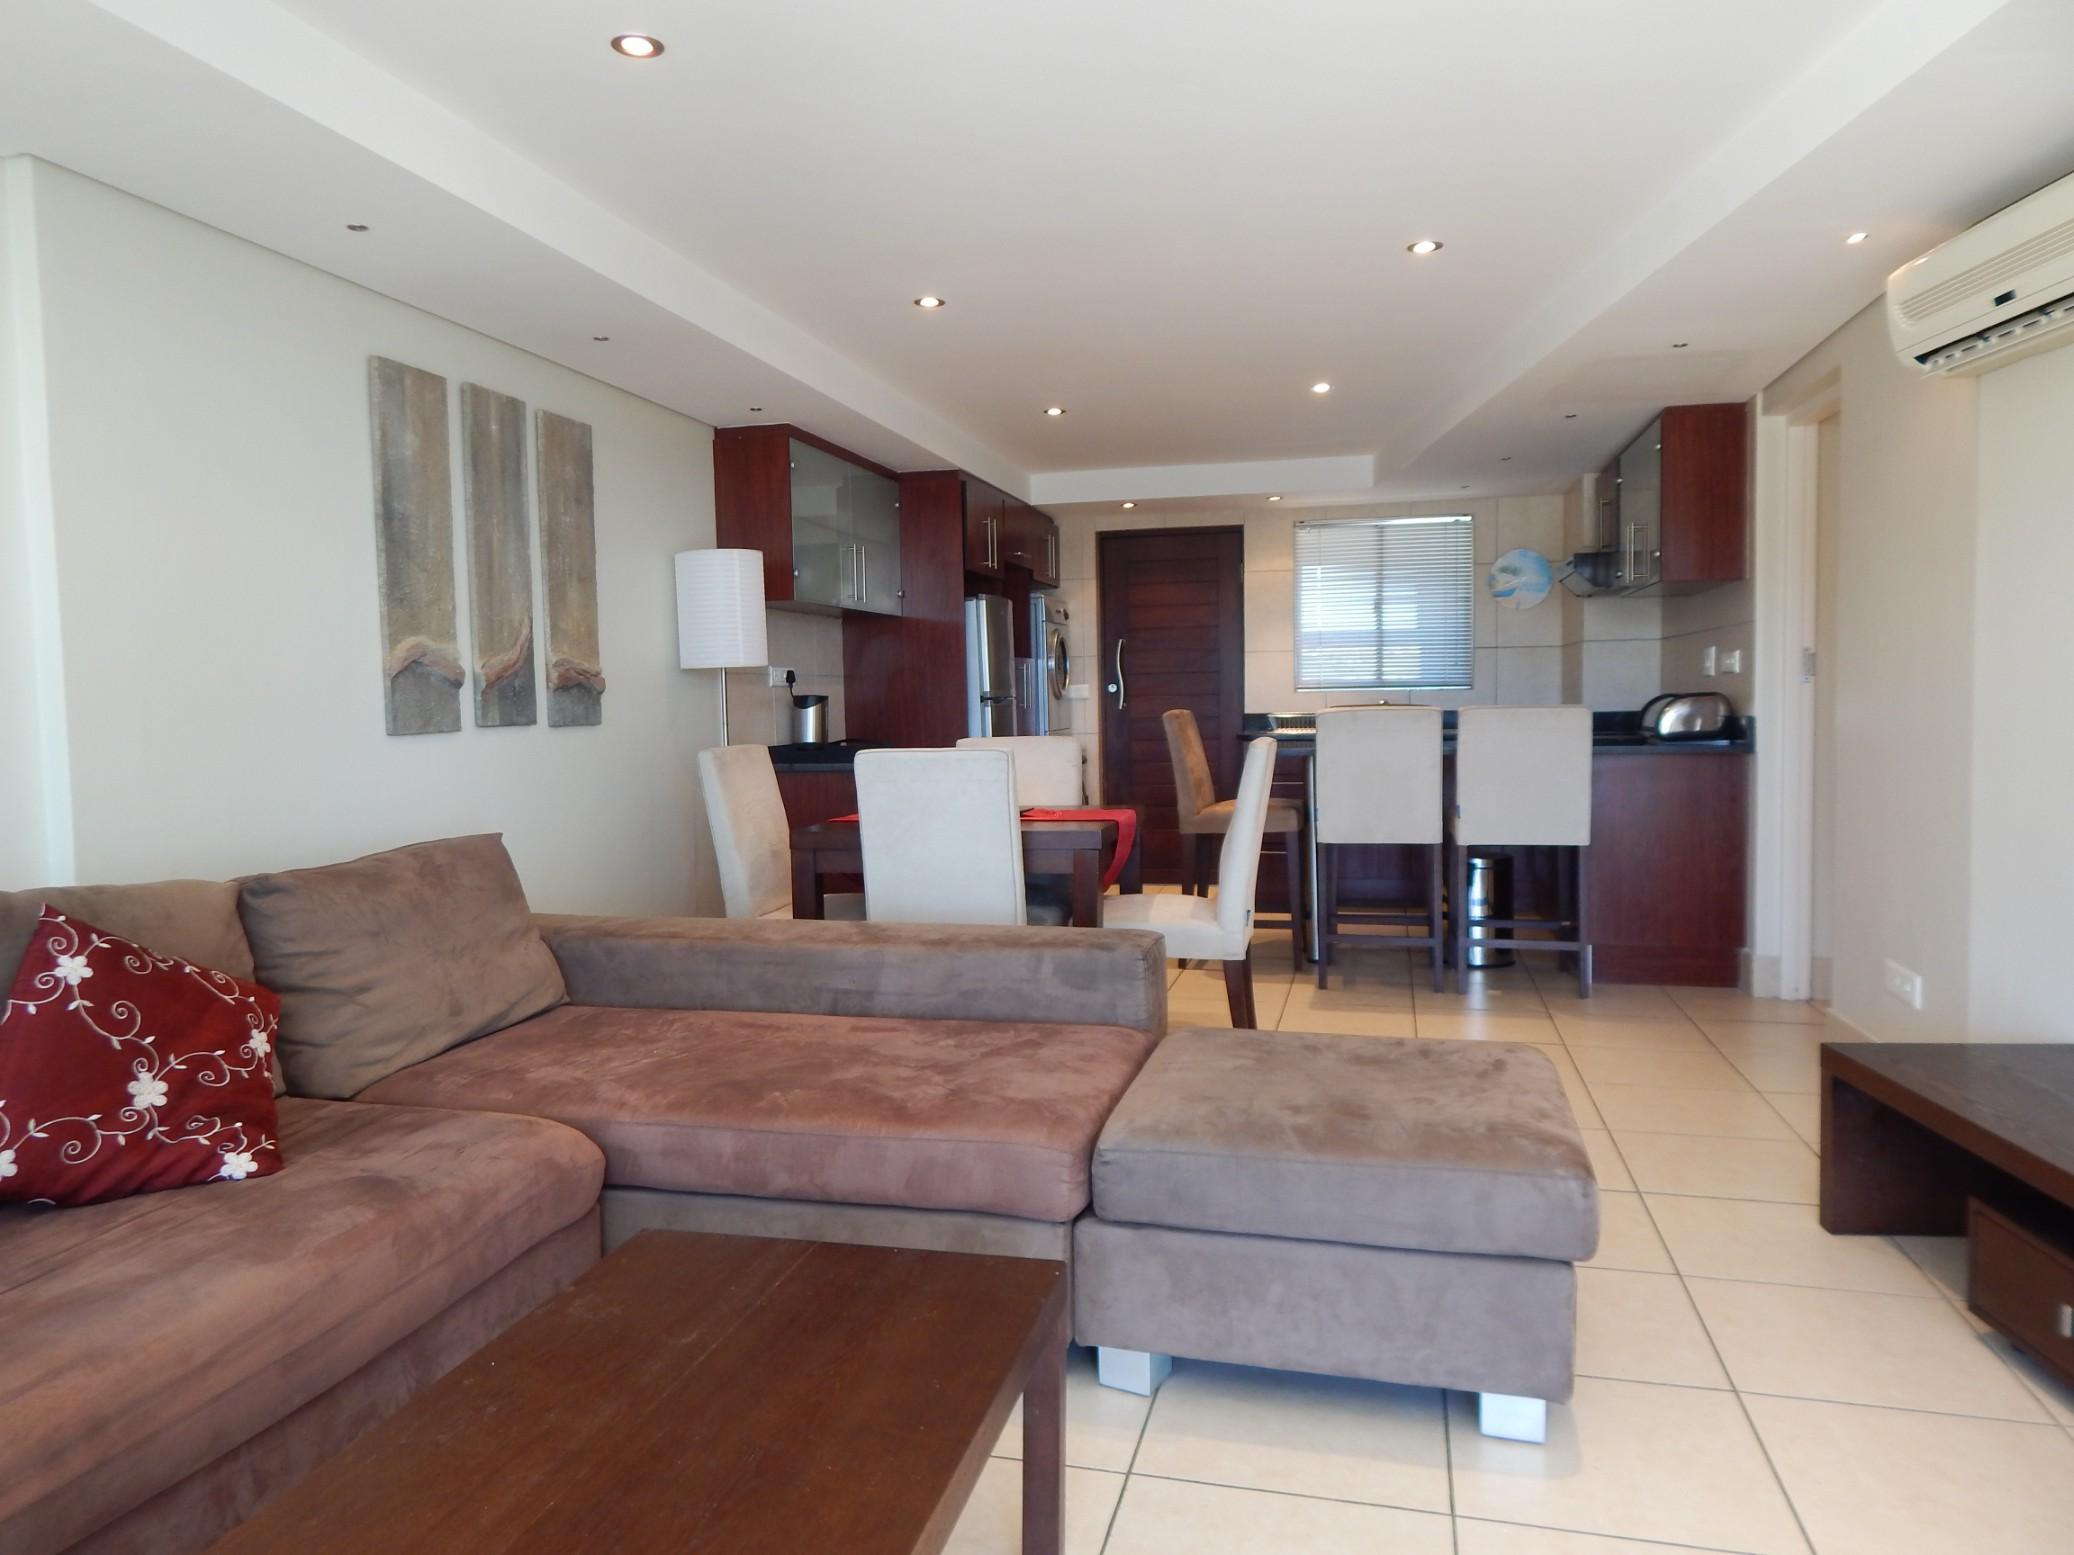 2 Bedroom Apartment for sale in De Bakke ENT0067862 : photo#4